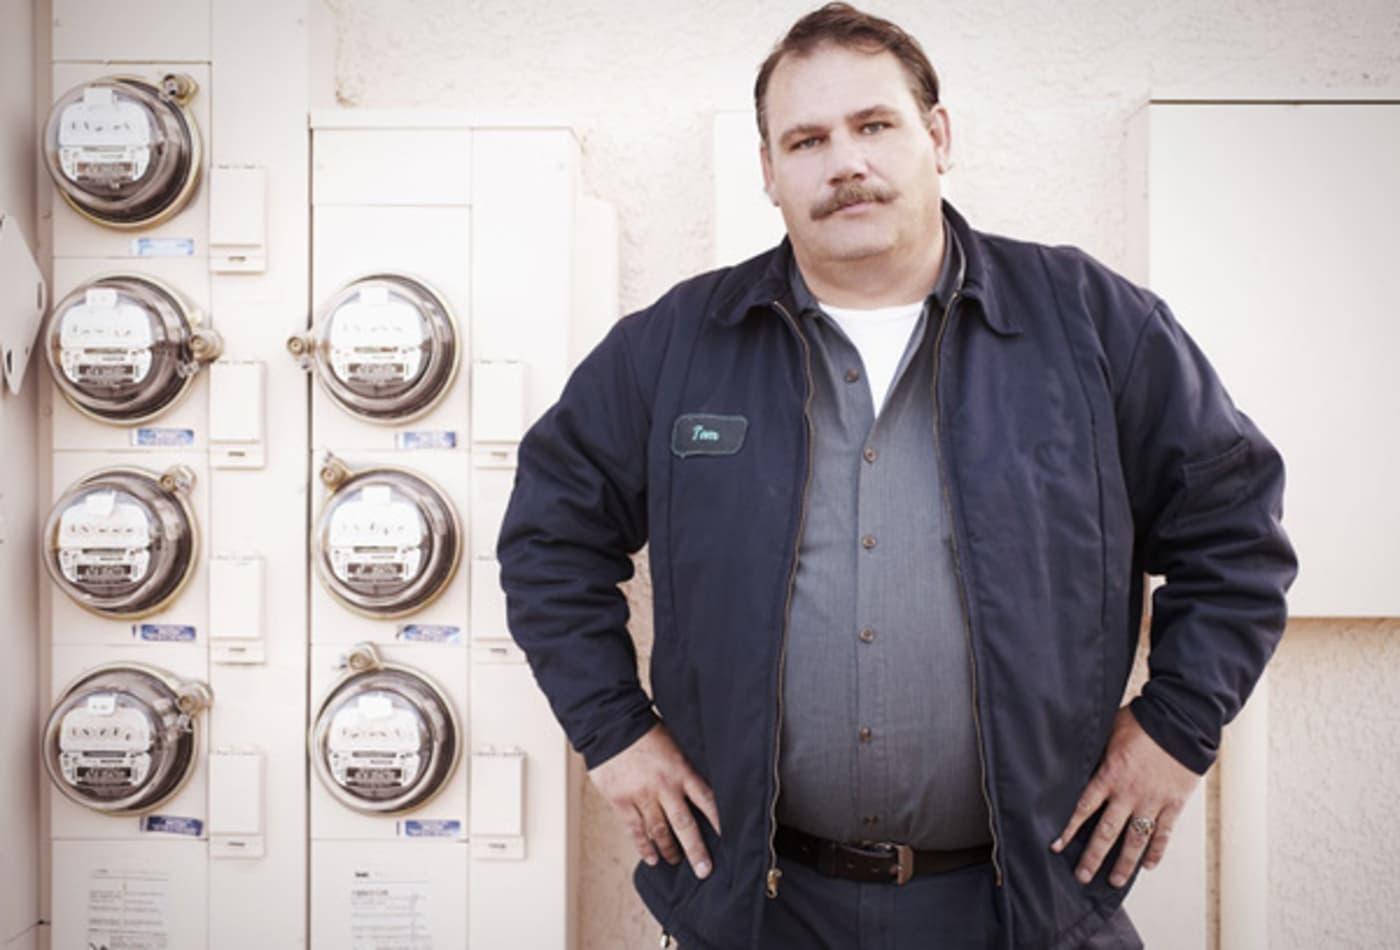 worst-jobs-2012-meter-reader.jpg